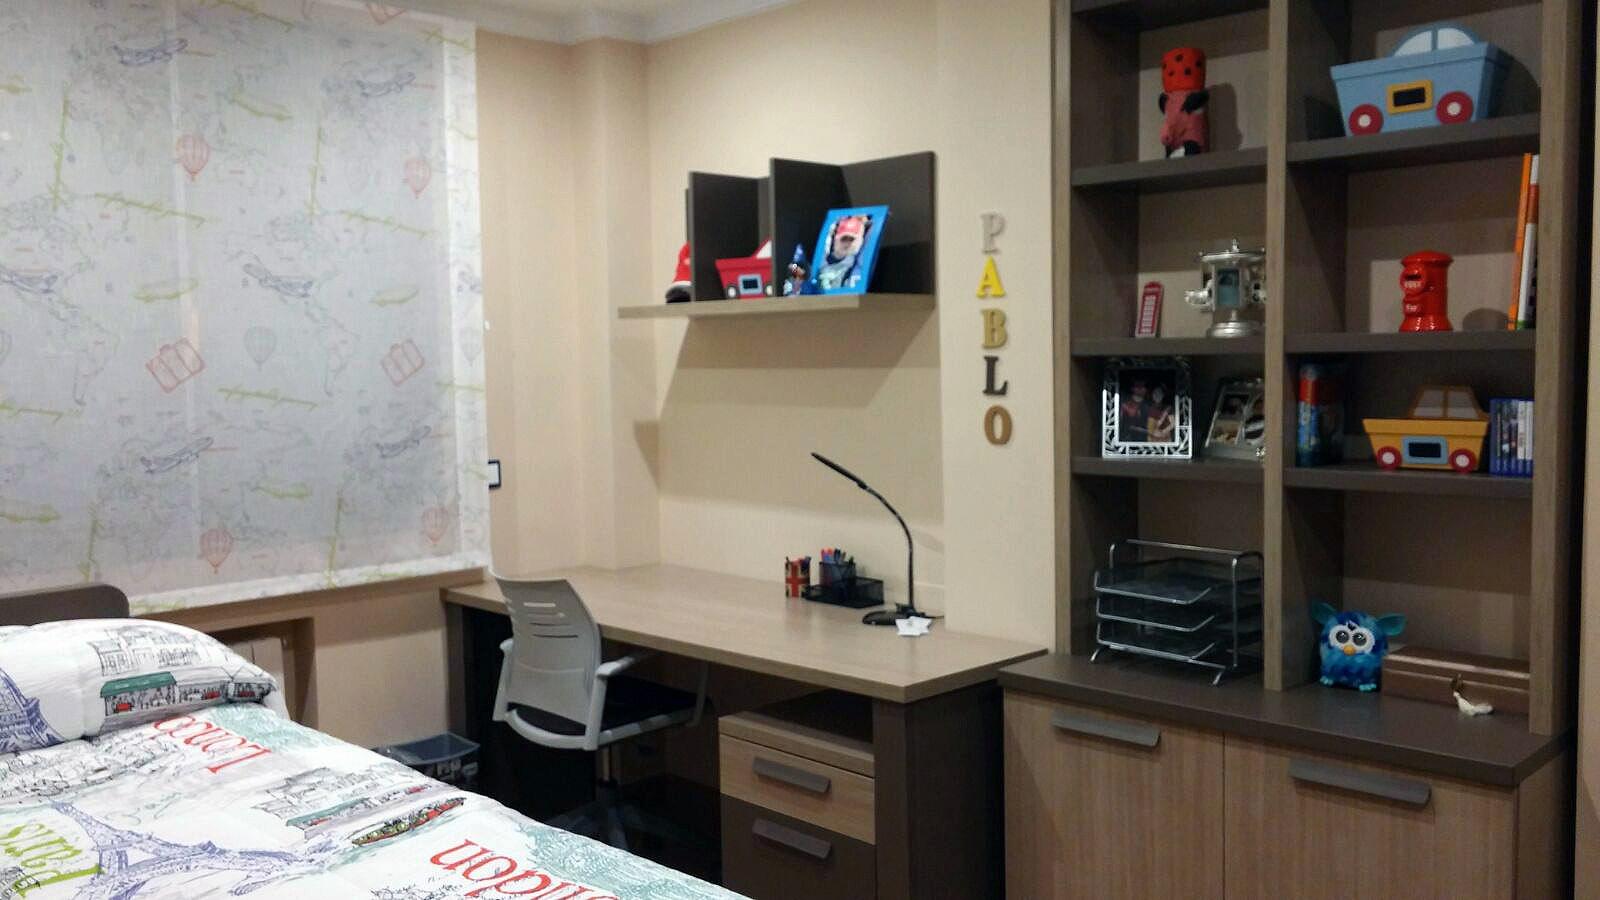 Proyecto de hogar 27736 habitaci n juvenil muebles casanova - Iluminacion habitacion juvenil ...